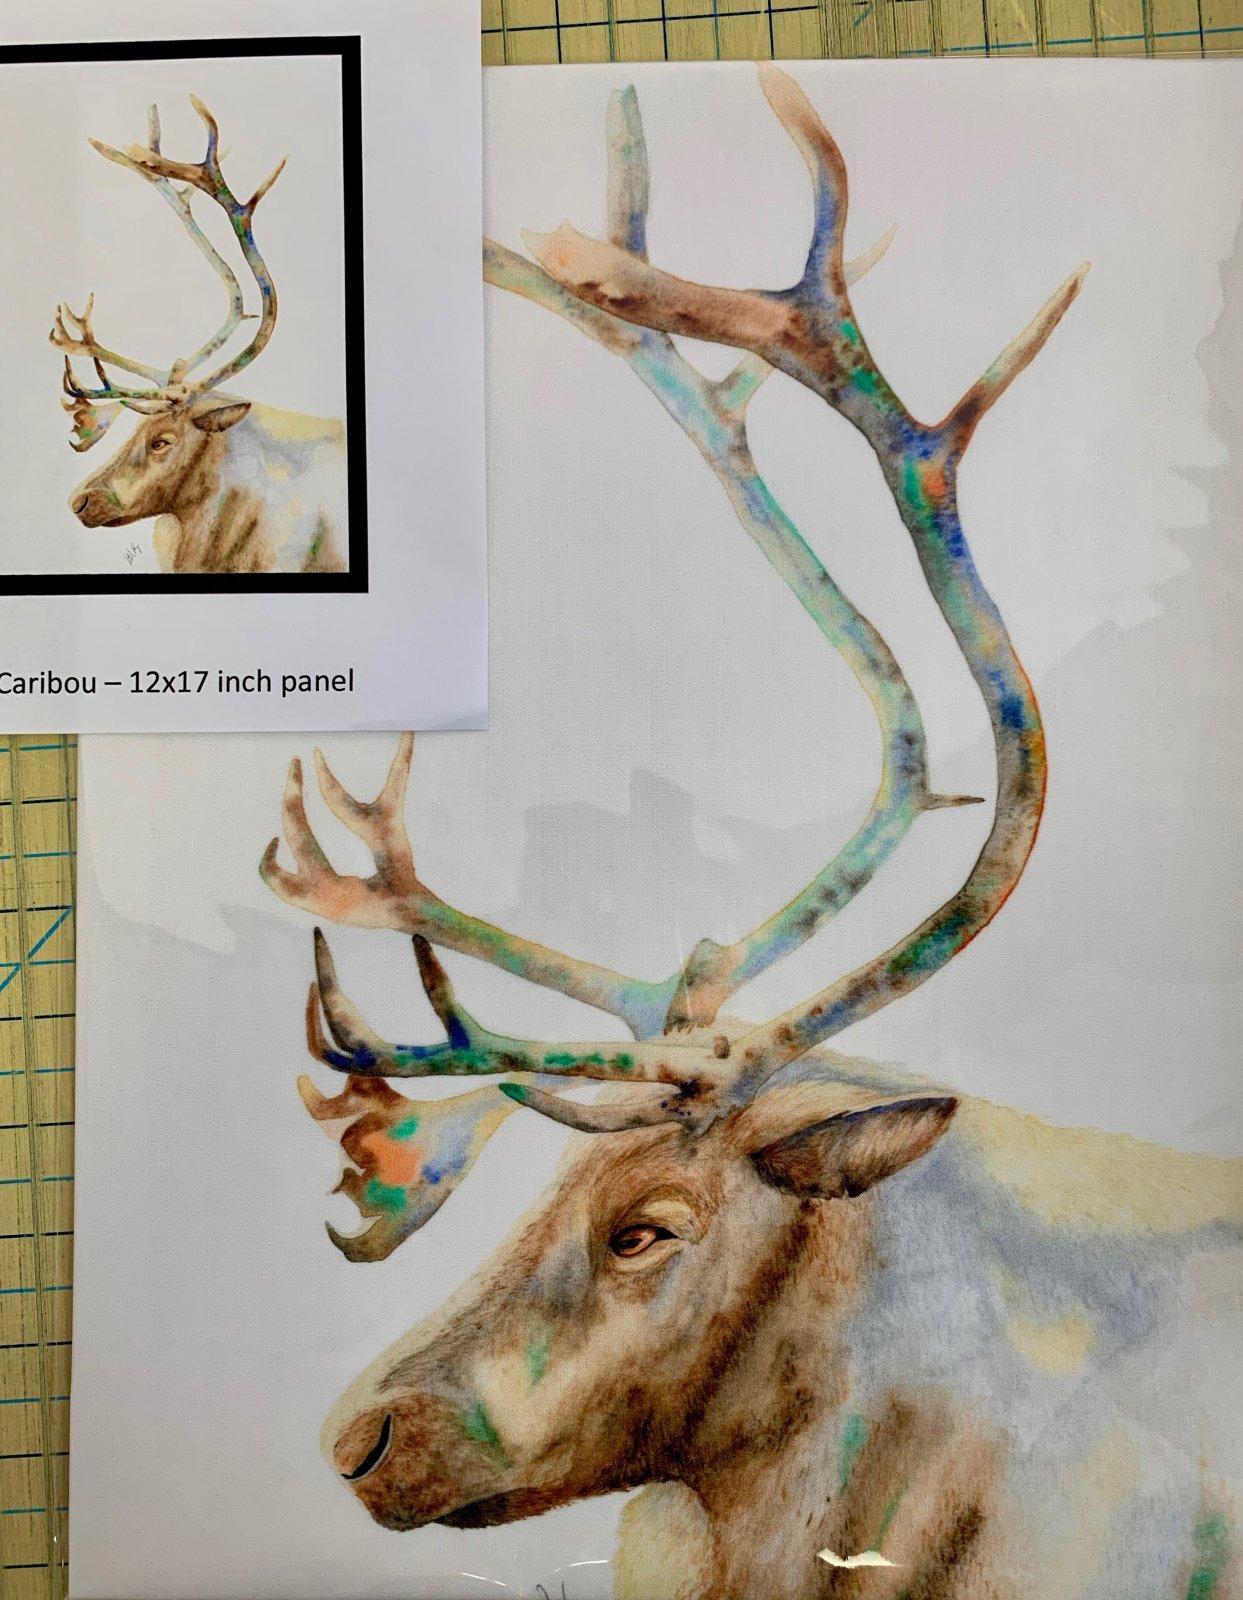 Caribou Fabric Panel